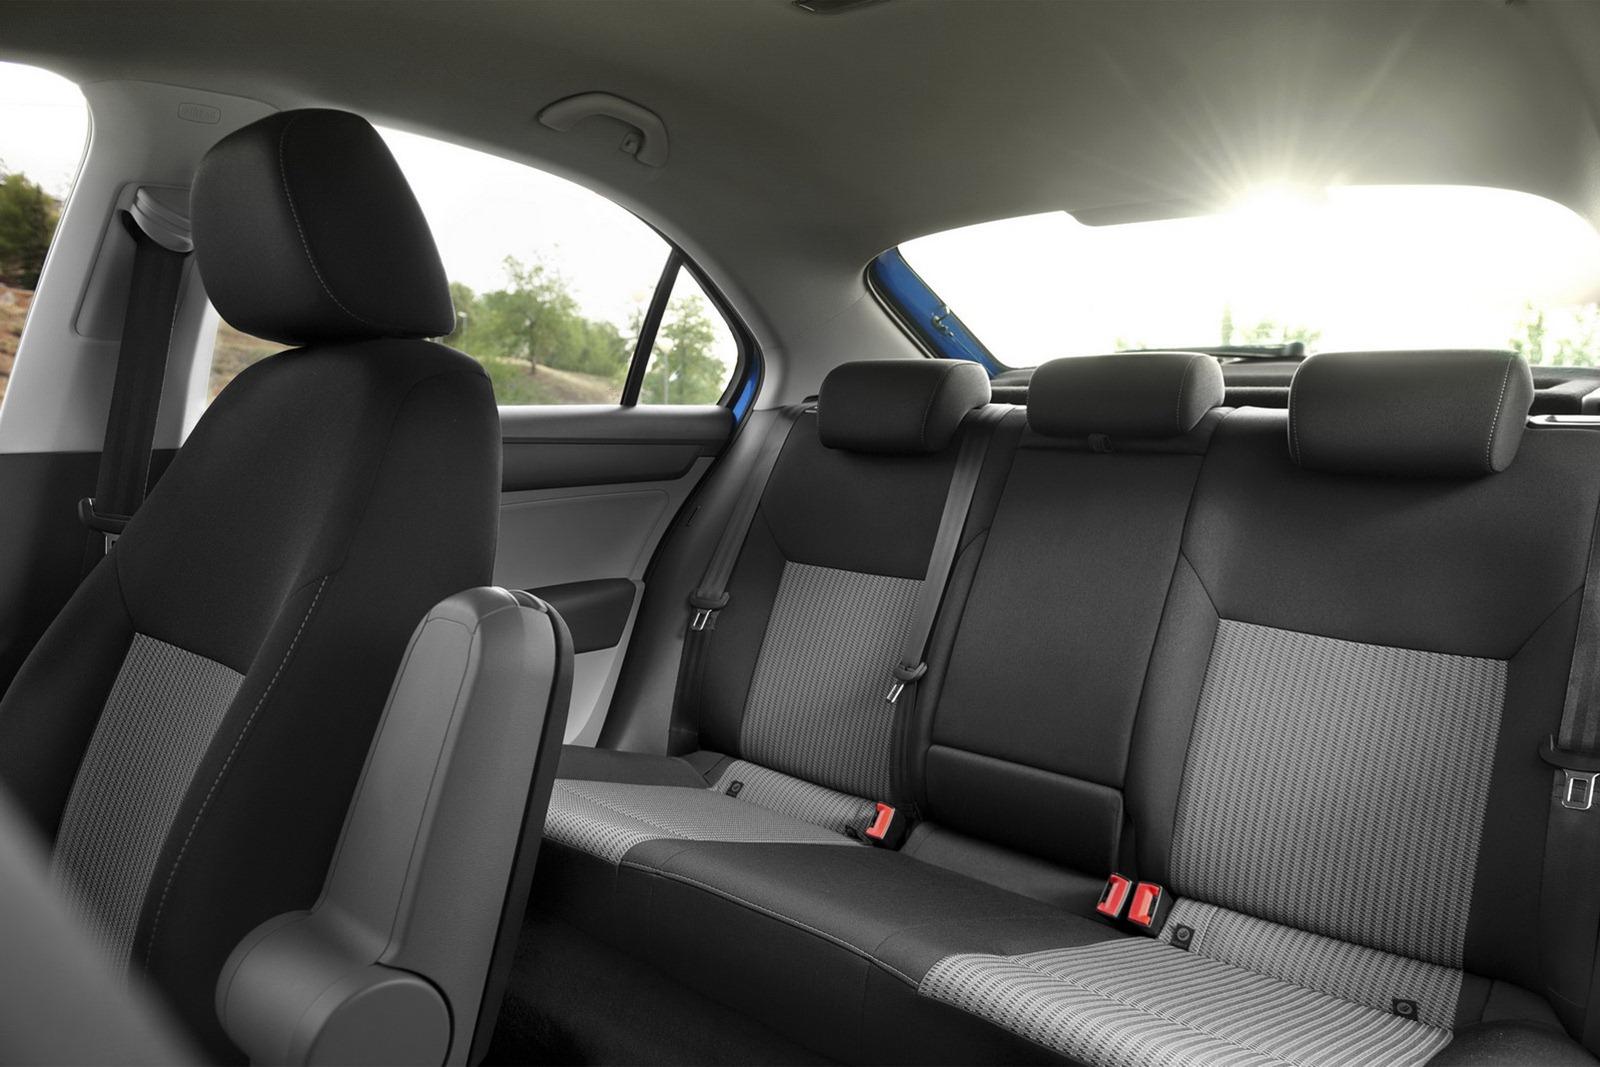 2012 - [Seat] Toledo IV - Page 6 2013-Seat-Toledo-Sedan-63%25255B2%25255D